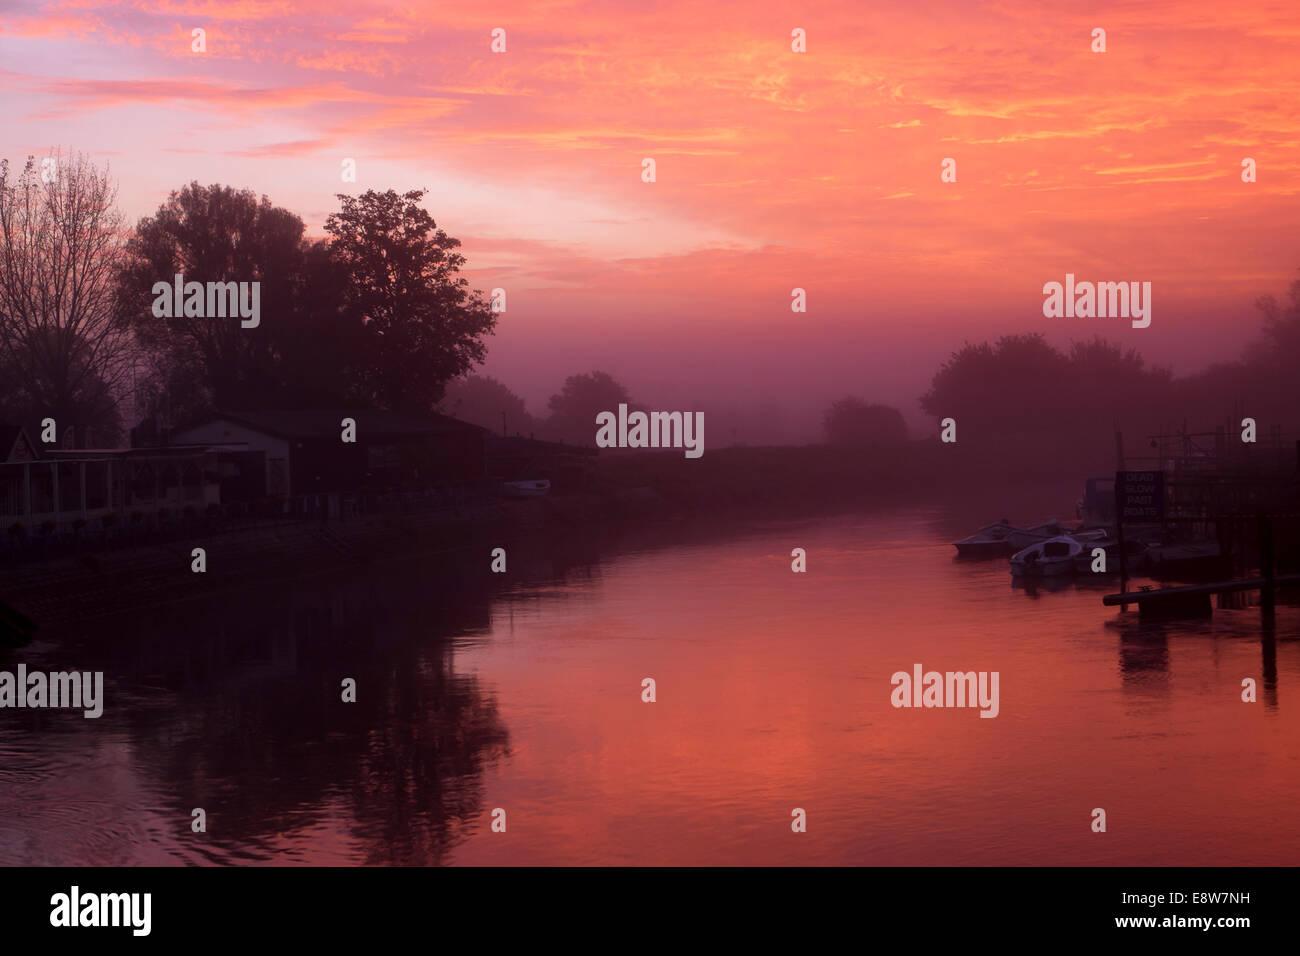 Arundel, West Sussex, UK. Wednesday 15th October, 2014. UK Weather: Arundel wakes to a glorious sunrise over the Stock Photo